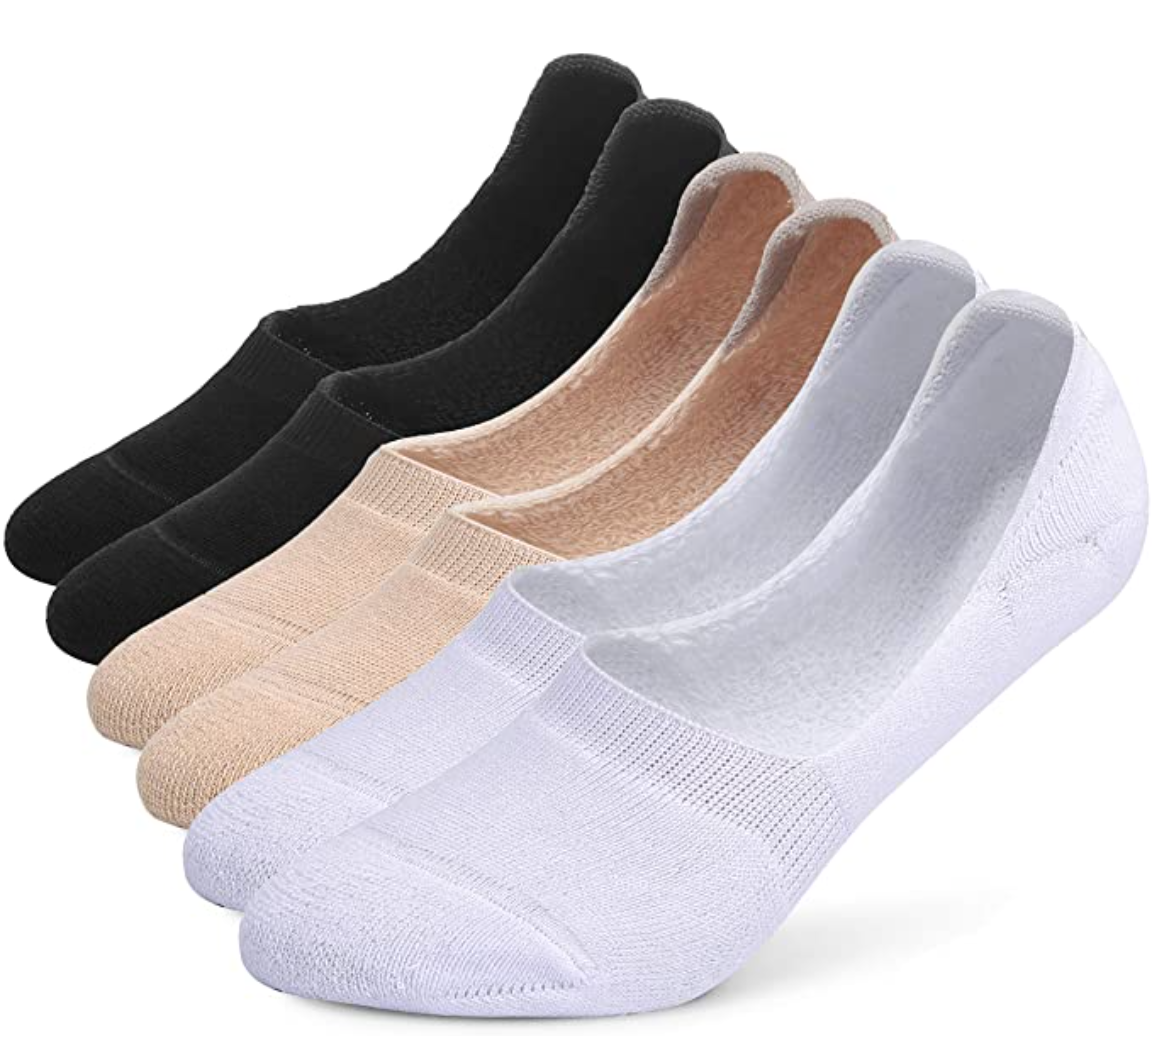 Amazon no show socks